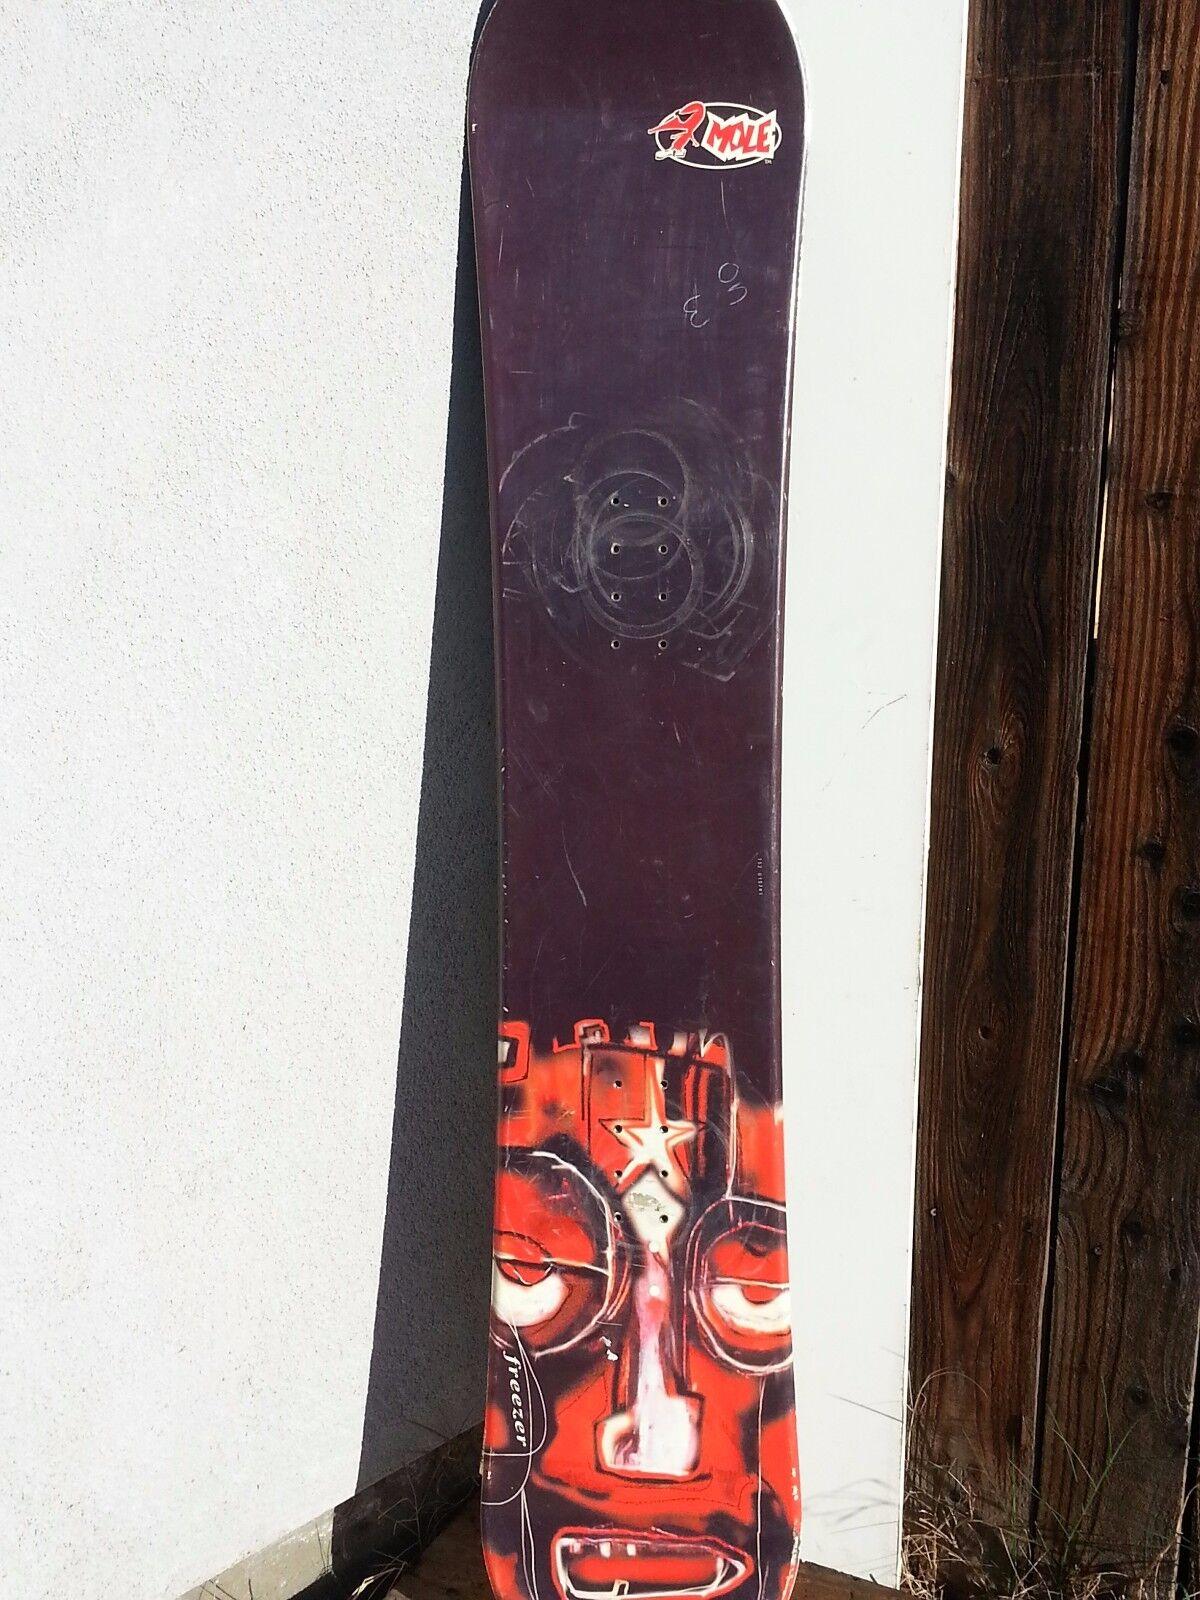 Mole Freezer Snowboard 150cm 59  w out bindings